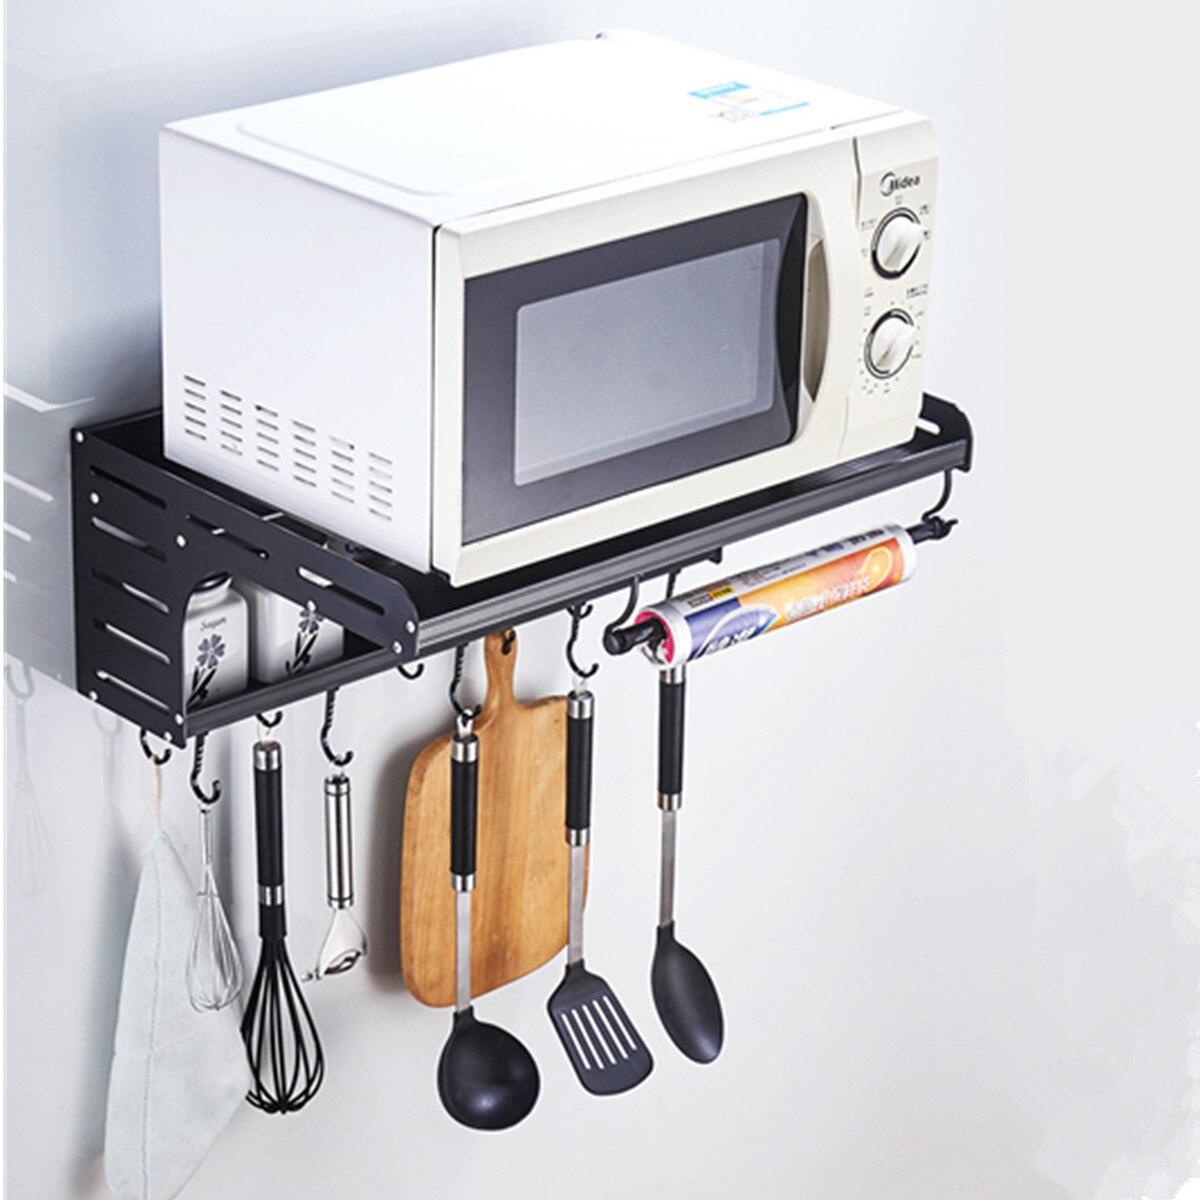 space aluminum microwave oven shelf bracket wall mounted kitchen rack 2 tier kitchen shelf microwave oven rack storage